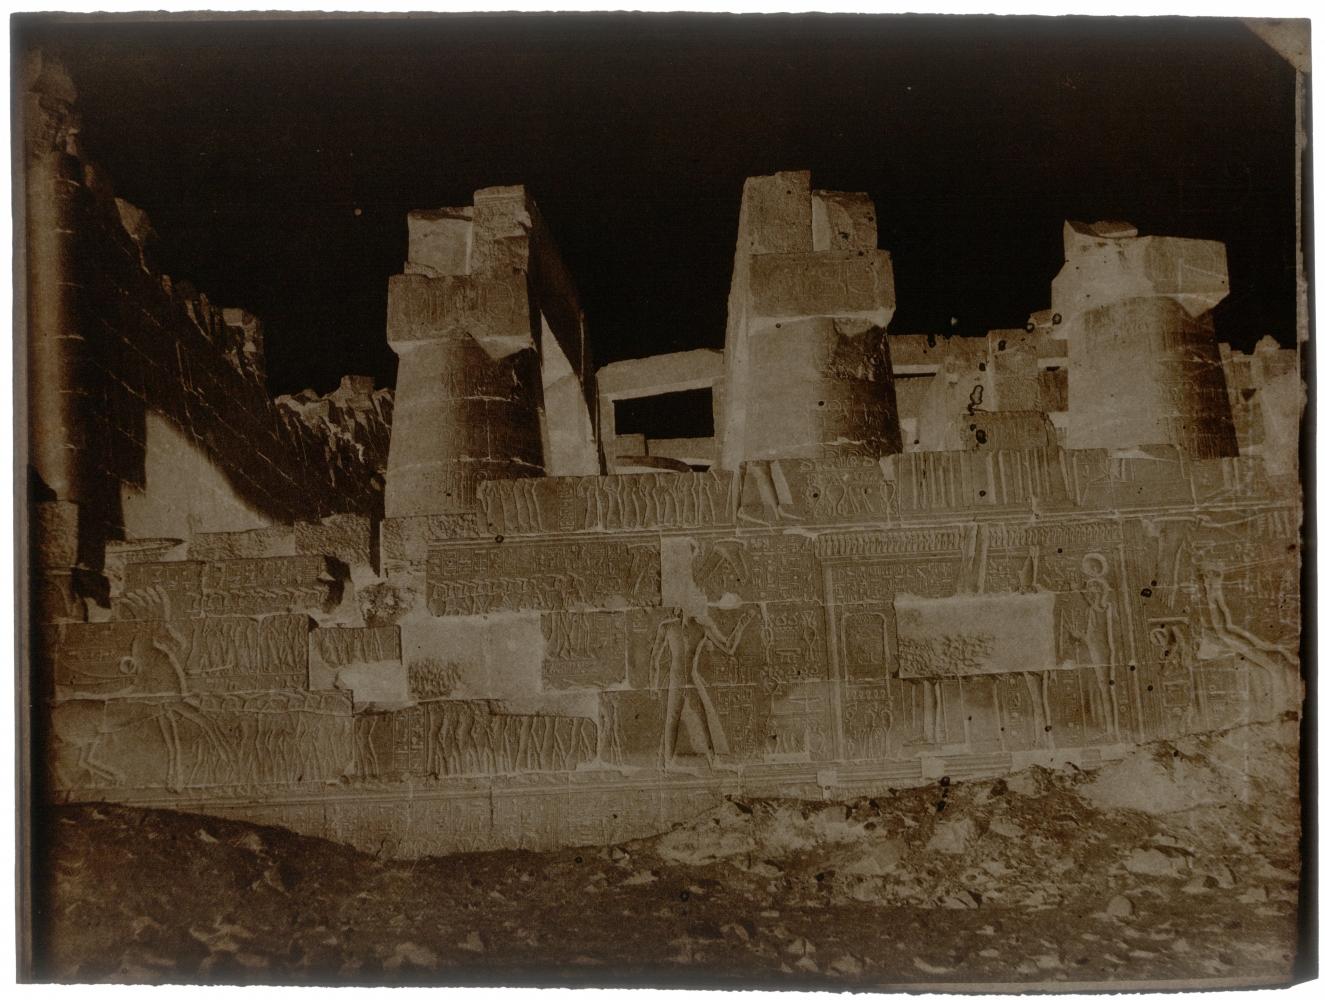 "John Beasley GREENE (American, born in France, 1832-1856) Great Hypostyle Hall, outer face, north wall, Karnak, 1854-1855 Waxed paper negative 24.0 x 31.8 cm  Watermark ""J Whatman"""